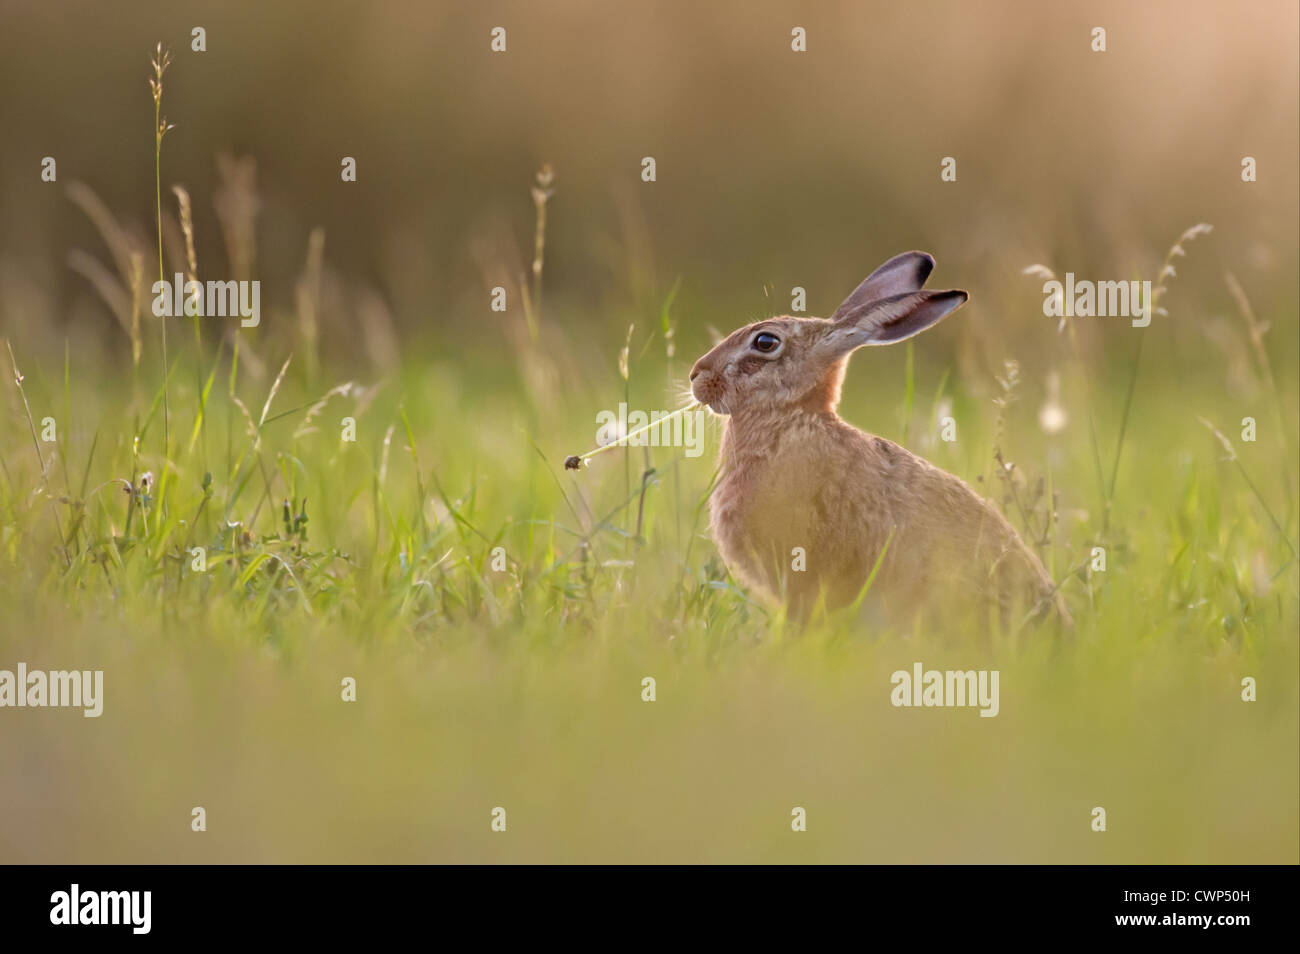 European Hare (Lepus europaeus) leveret, feeding on dandelion stem, Tamworth, Staffordshire, England, august - Stock Image